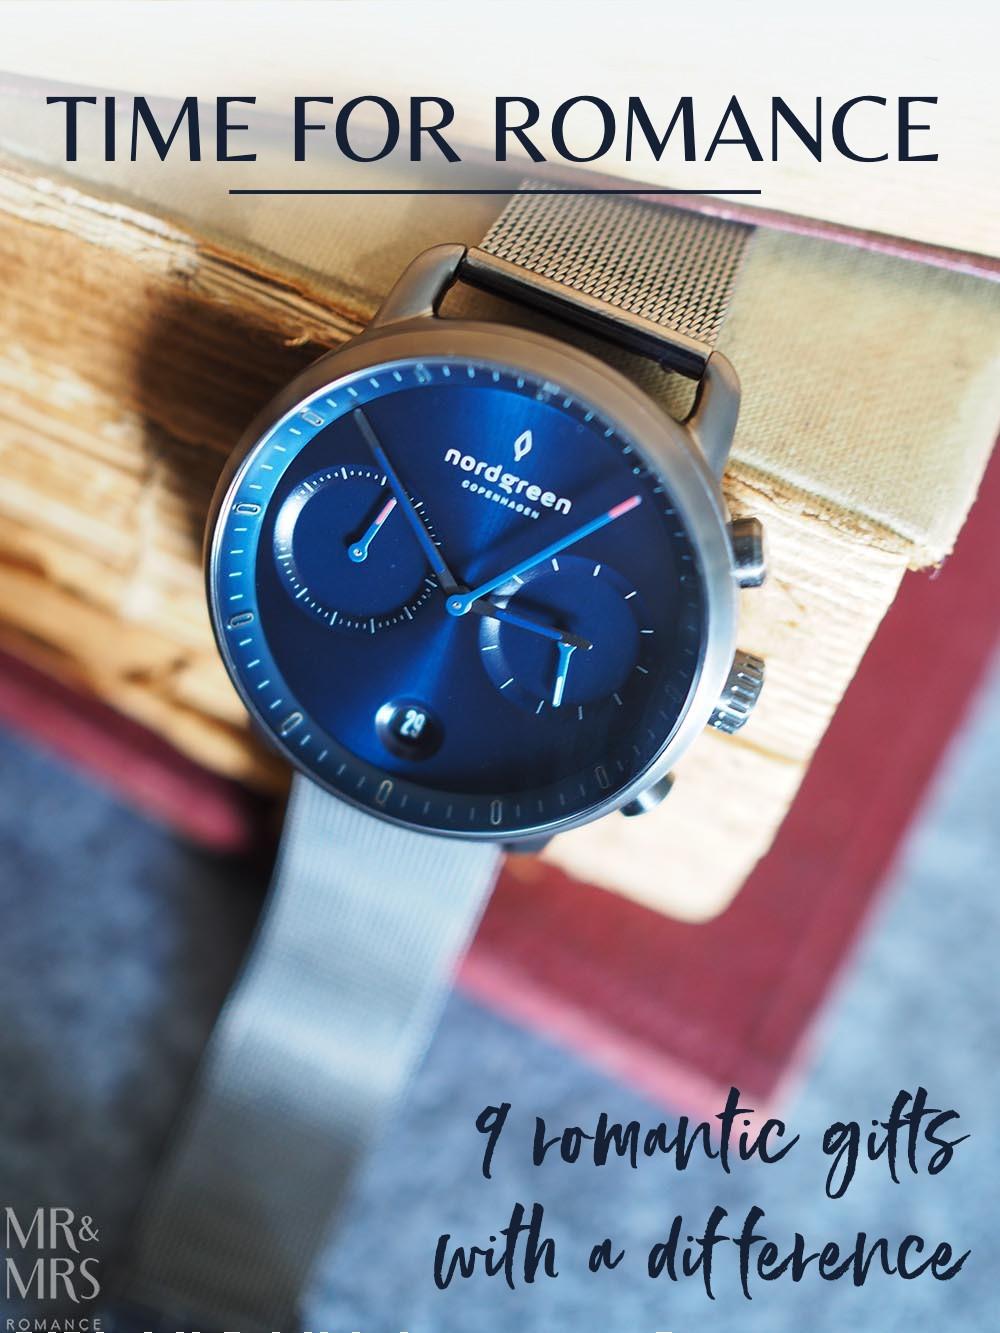 Nordgreen watch - Pioneer navy and gunmetal - romantic gifts